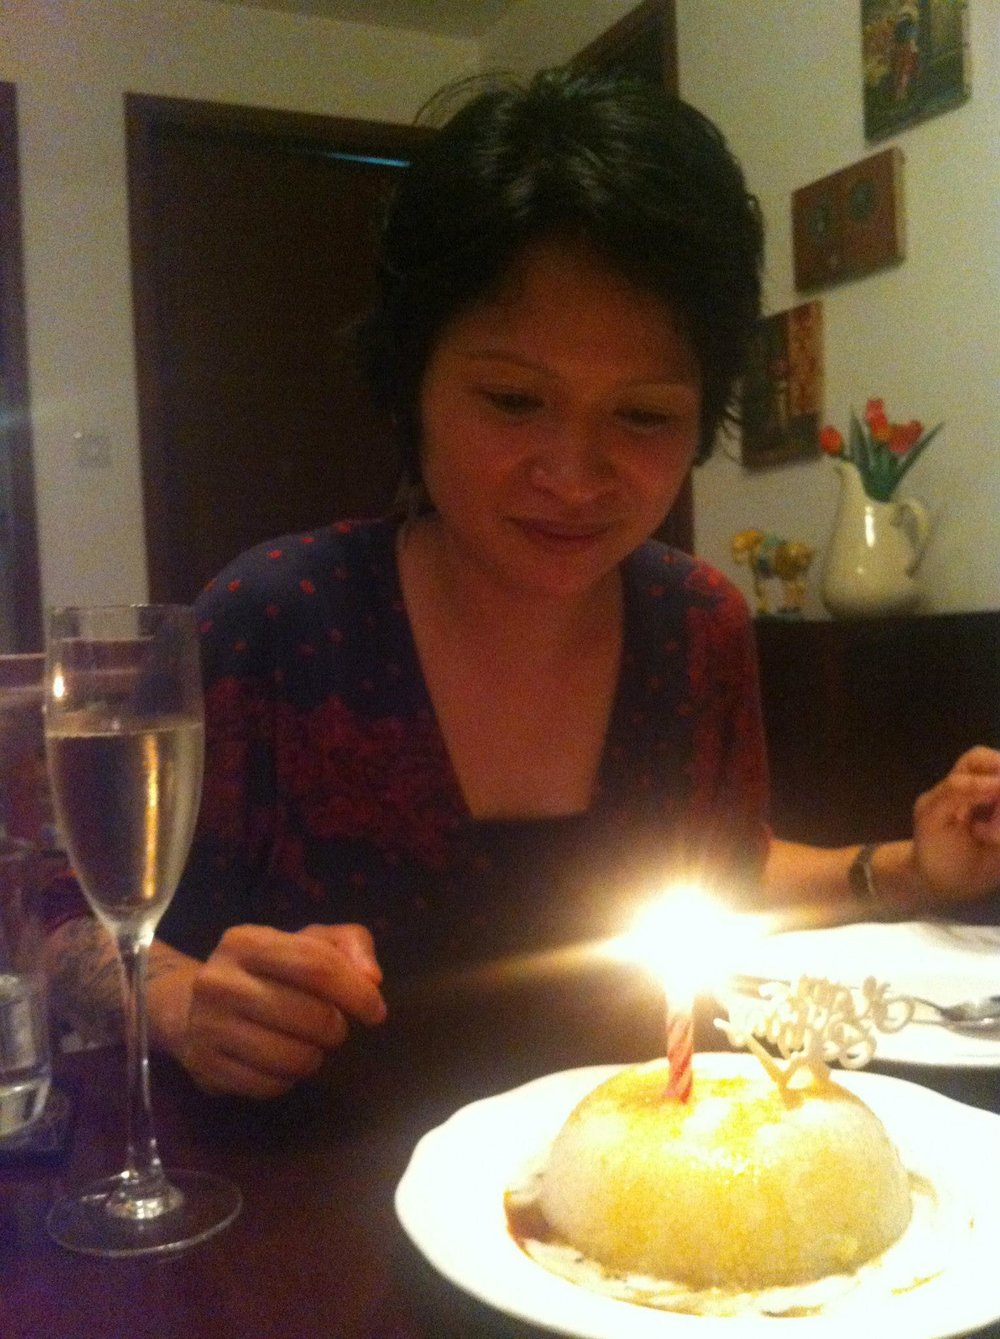 Lyra having a Birthday dinner prepped by flatmates in Singapore.